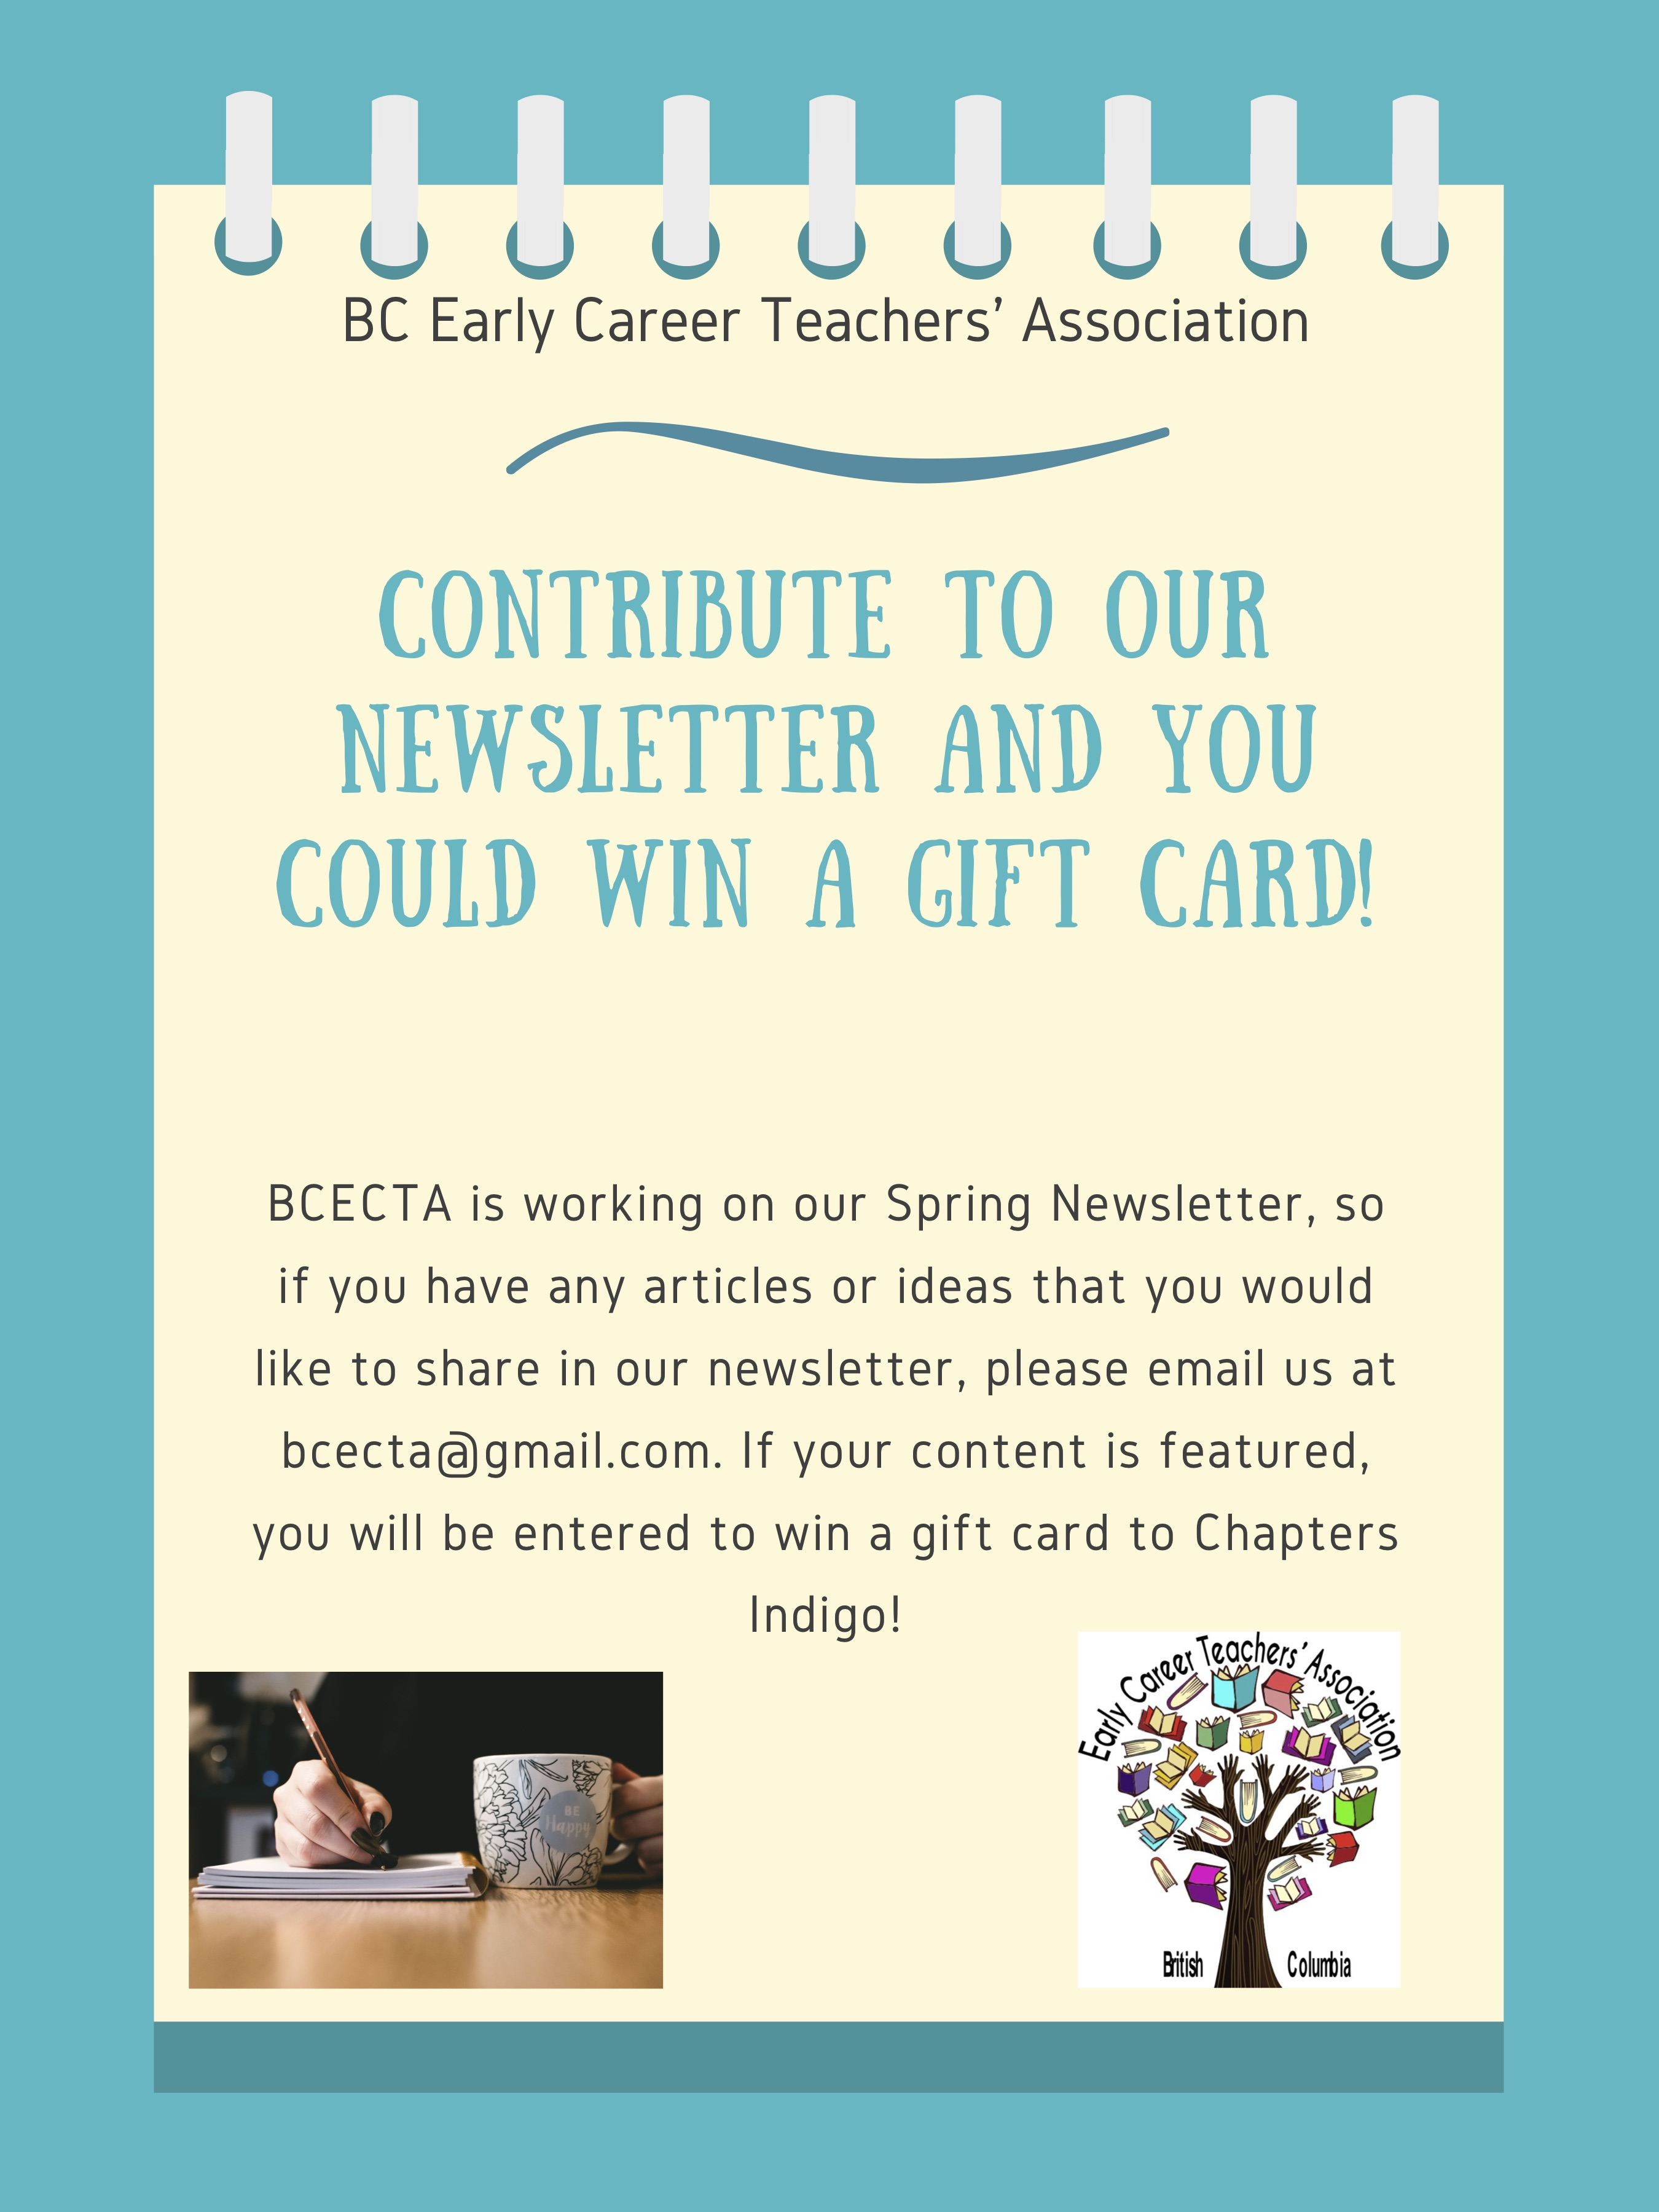 BCECTA GiftCard copy